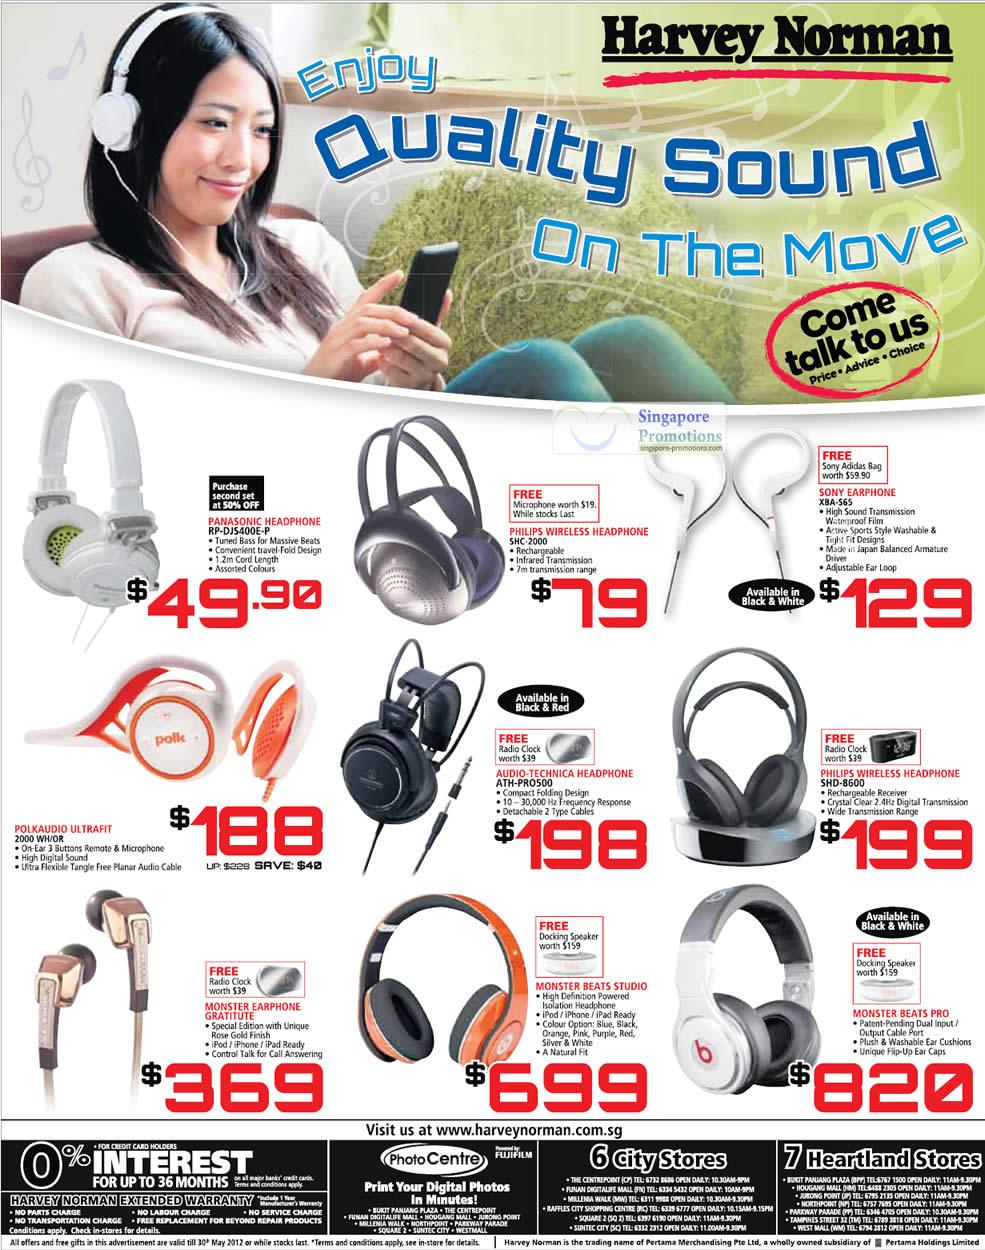 Earphones, Headphones, Panasonic, Philips, Sony, Audio-Technica, Polkaudio, Monster